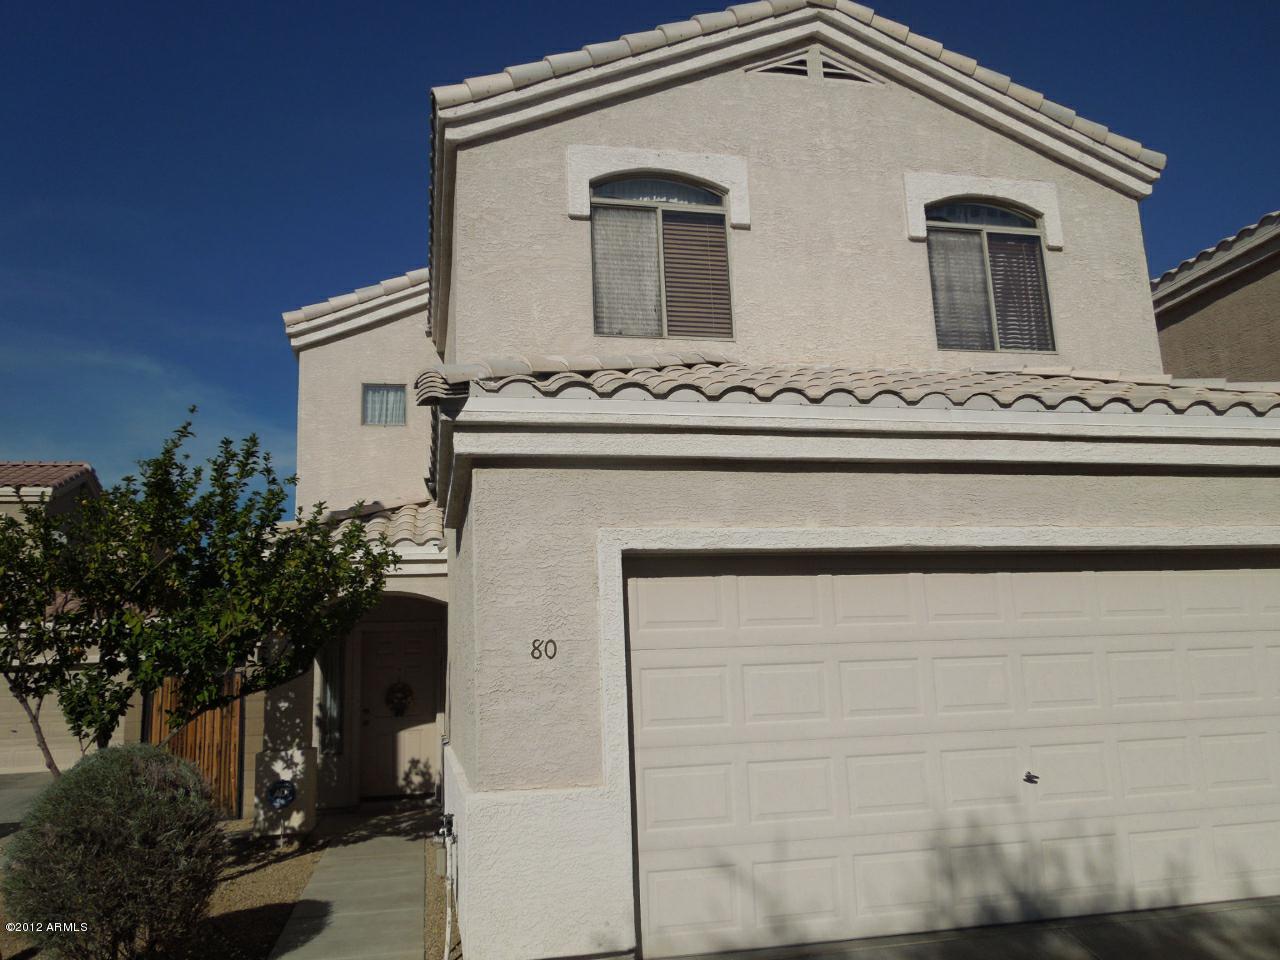 1750 W Union Hills Drive #80, Phoenix, AZ 85027 (MLS #4860240) :: The Daniel Montez Real Estate Group